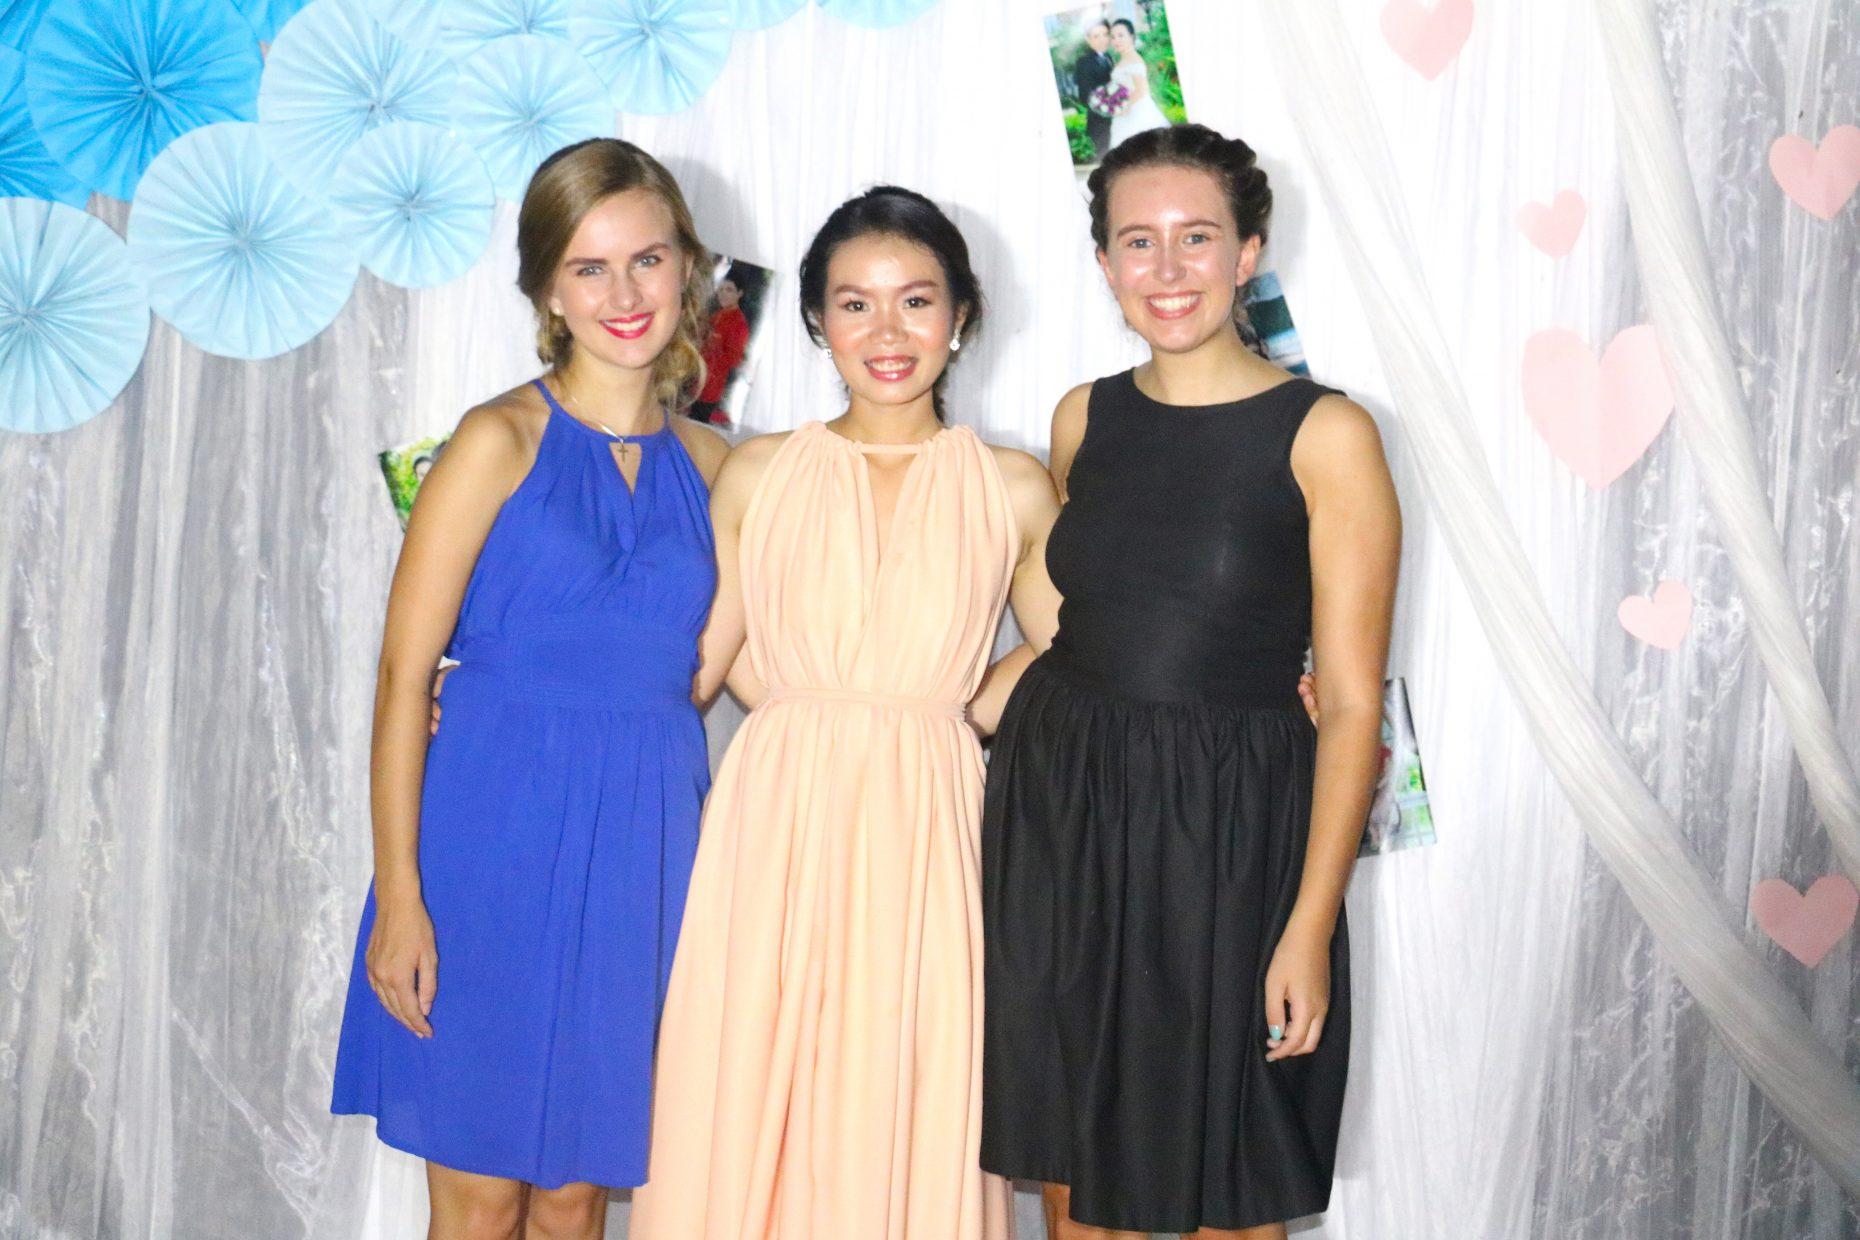 bbe6c0db Bryllup i Kambodsja. Den siste helga i januar ble vi ...